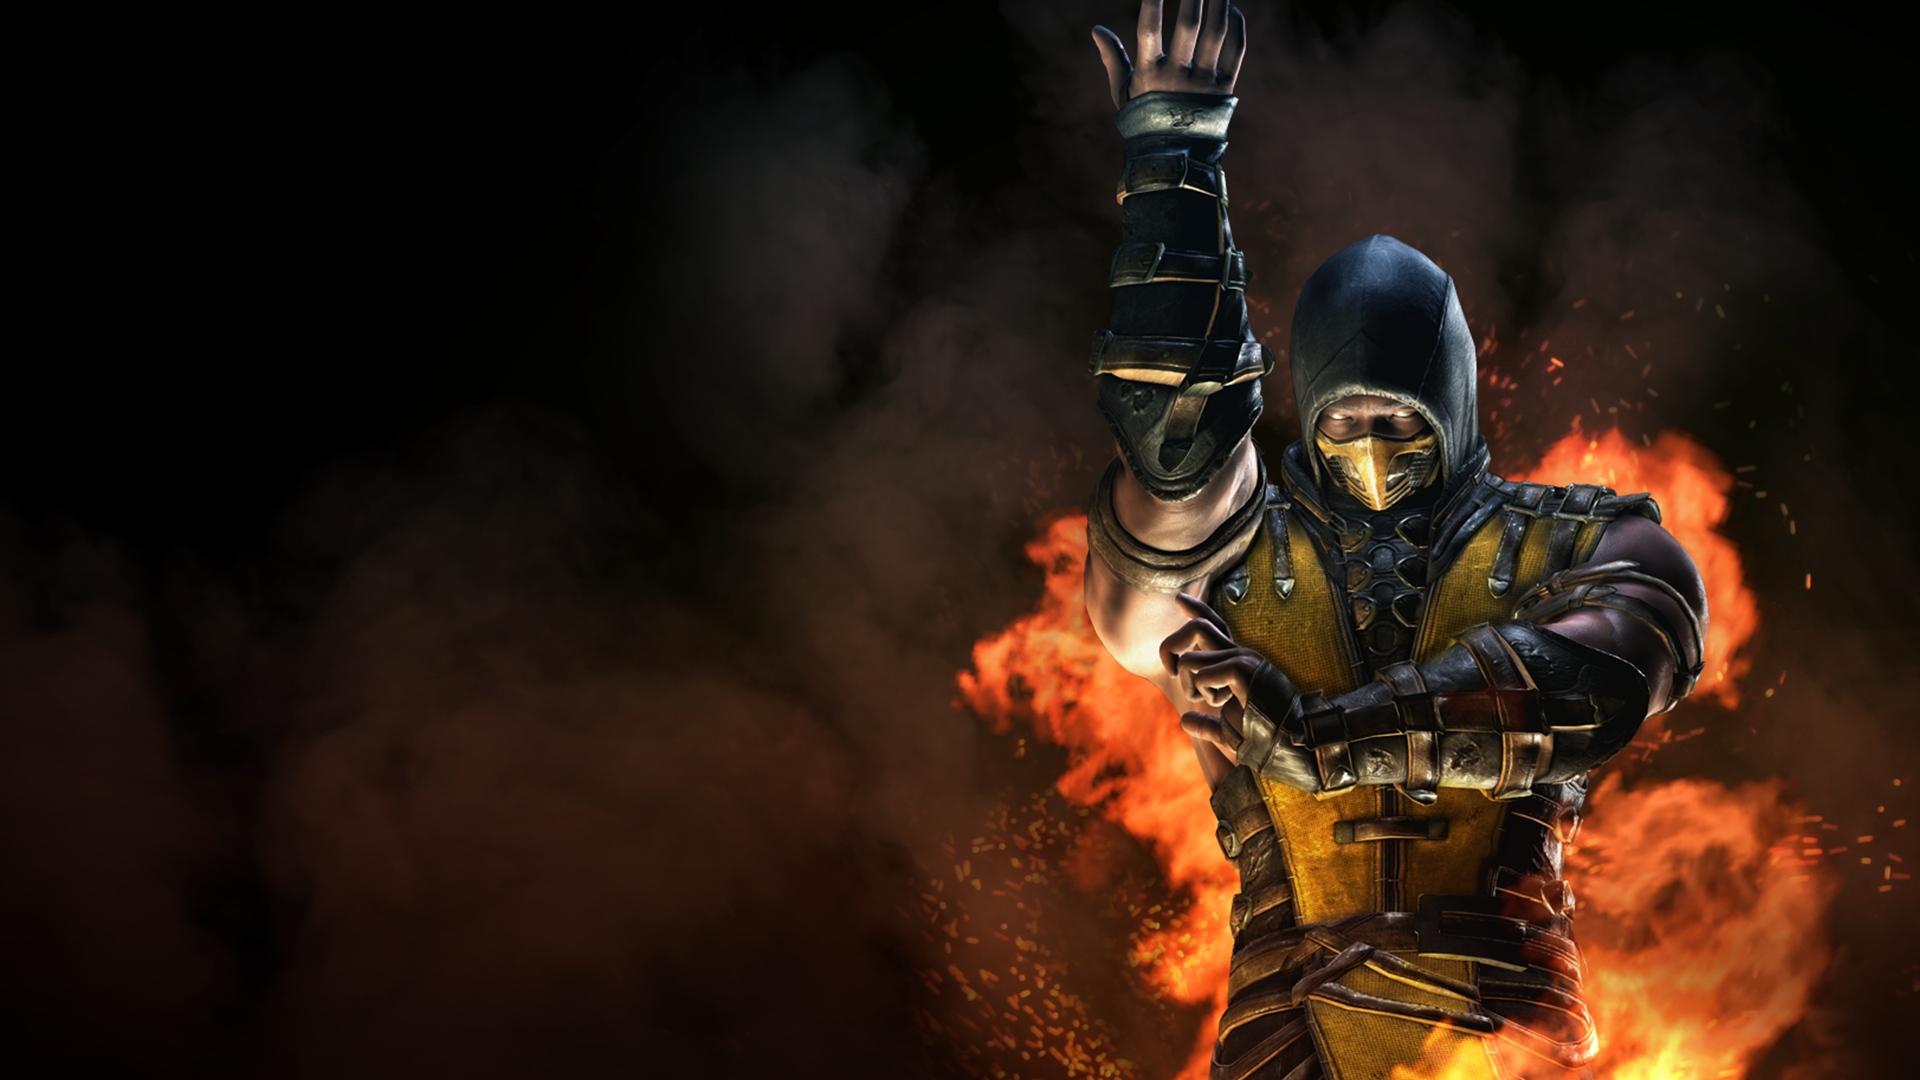 Scorpion Mortal Kombat X Characters Wallpapers HD 1920x1080